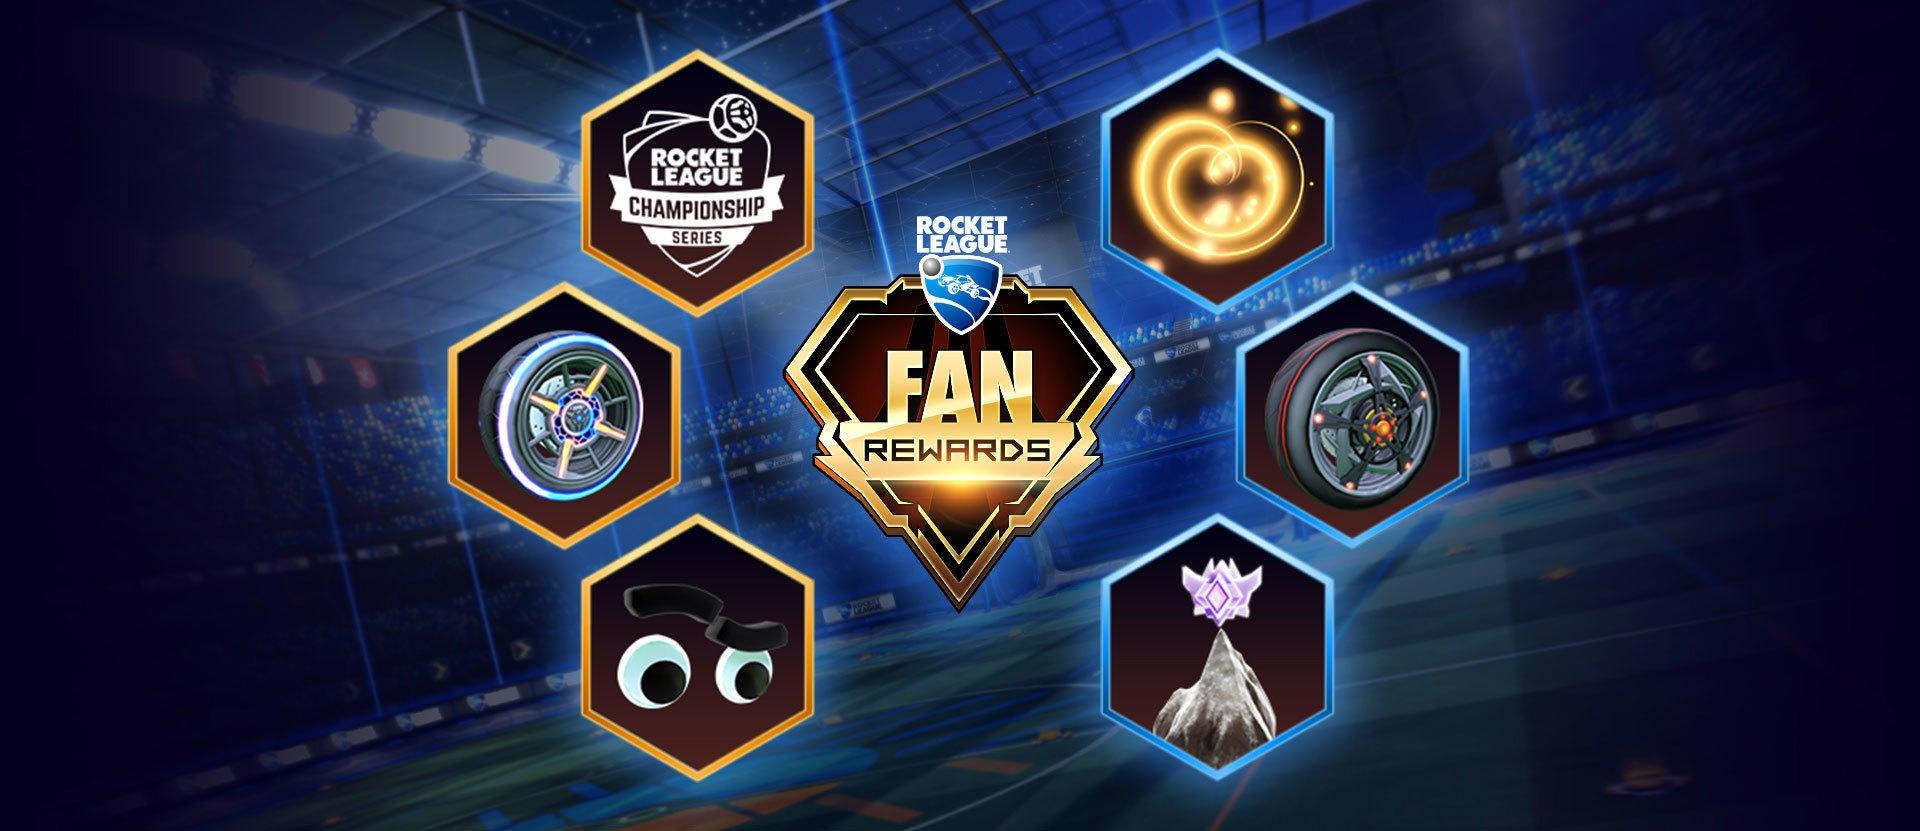 Fan Rewards Introduced During RLCS World Championship